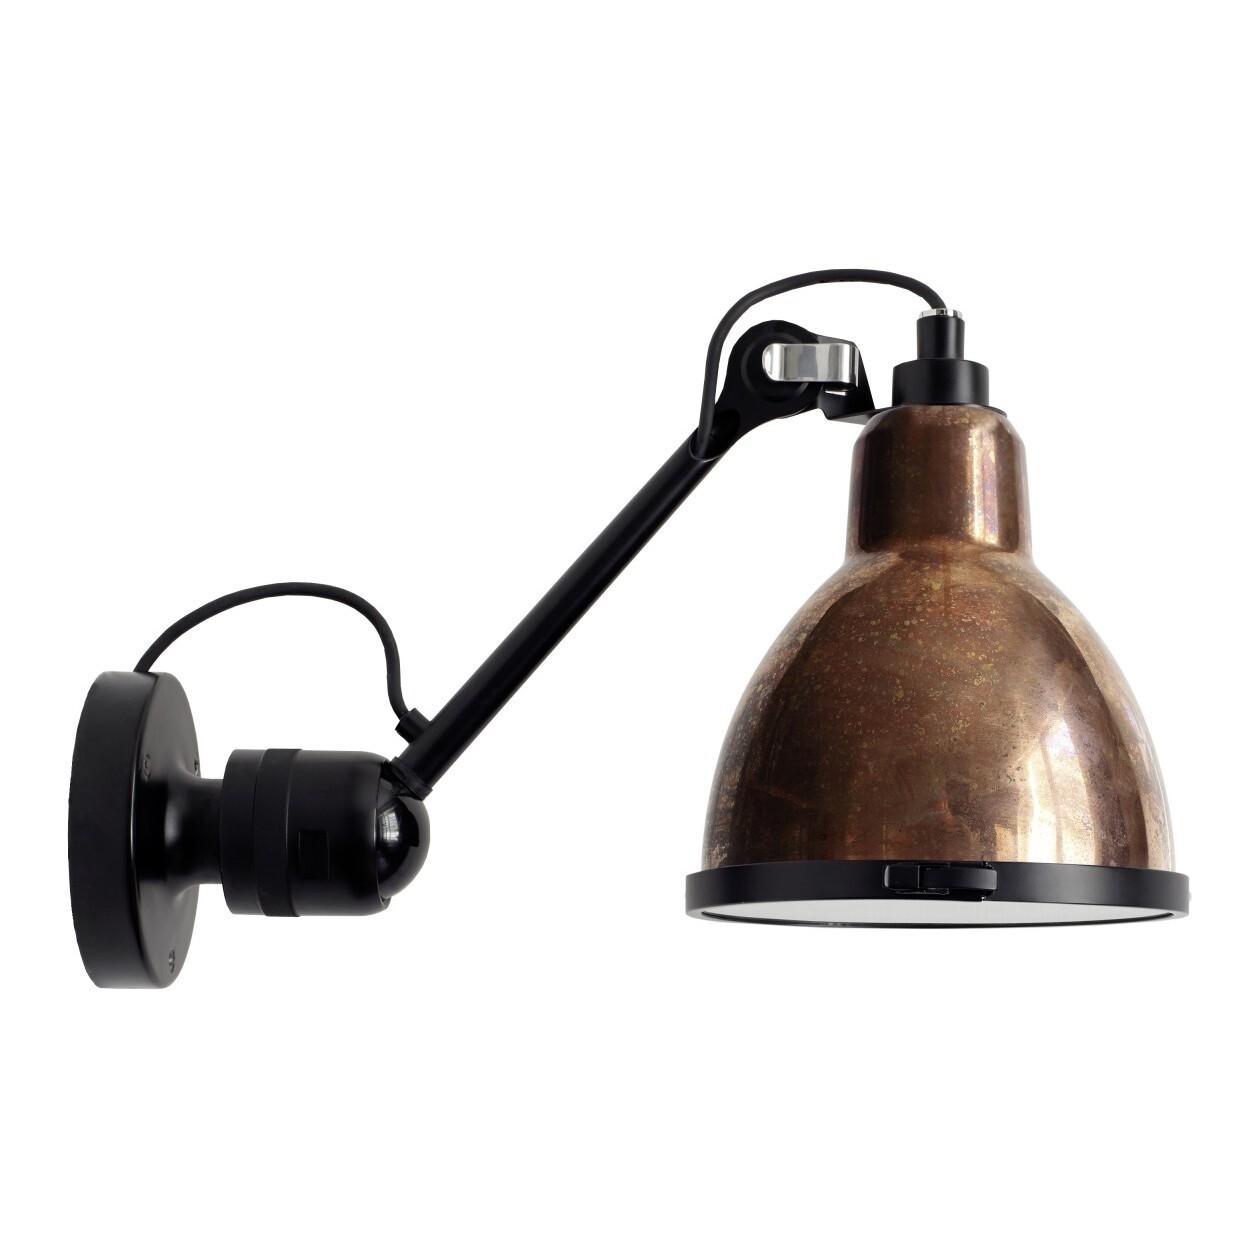 304 XL Outdoor Seaside Væglampe Kobber/Hvid - Lampe Gras thumbnail